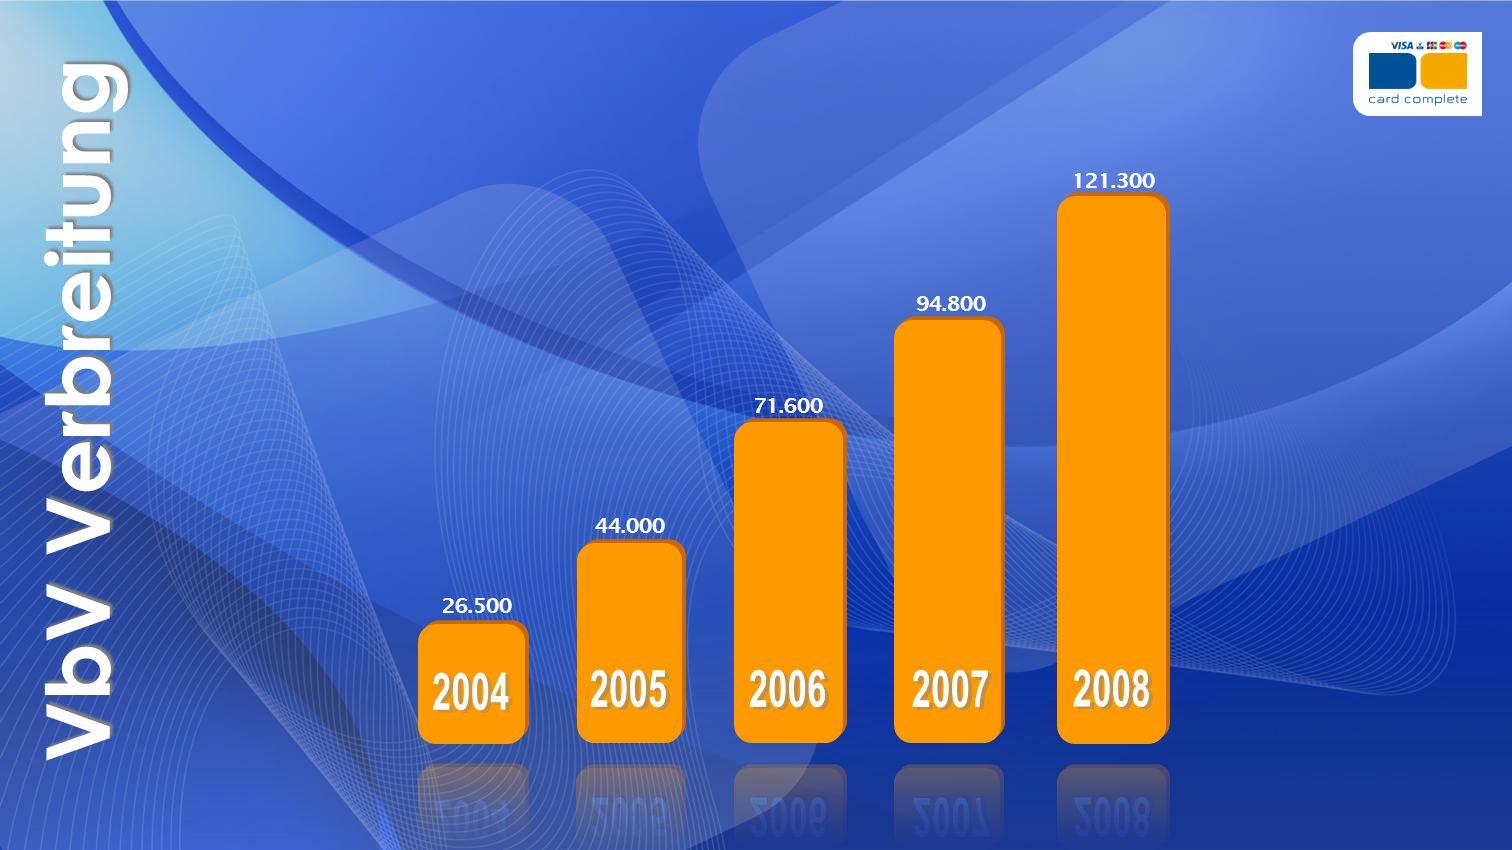 121.300 94.800. VbV Verbreitung. 71.600. 44.000. 26.500. 2004. 2005. 2006. 2007. 2008. 2004.